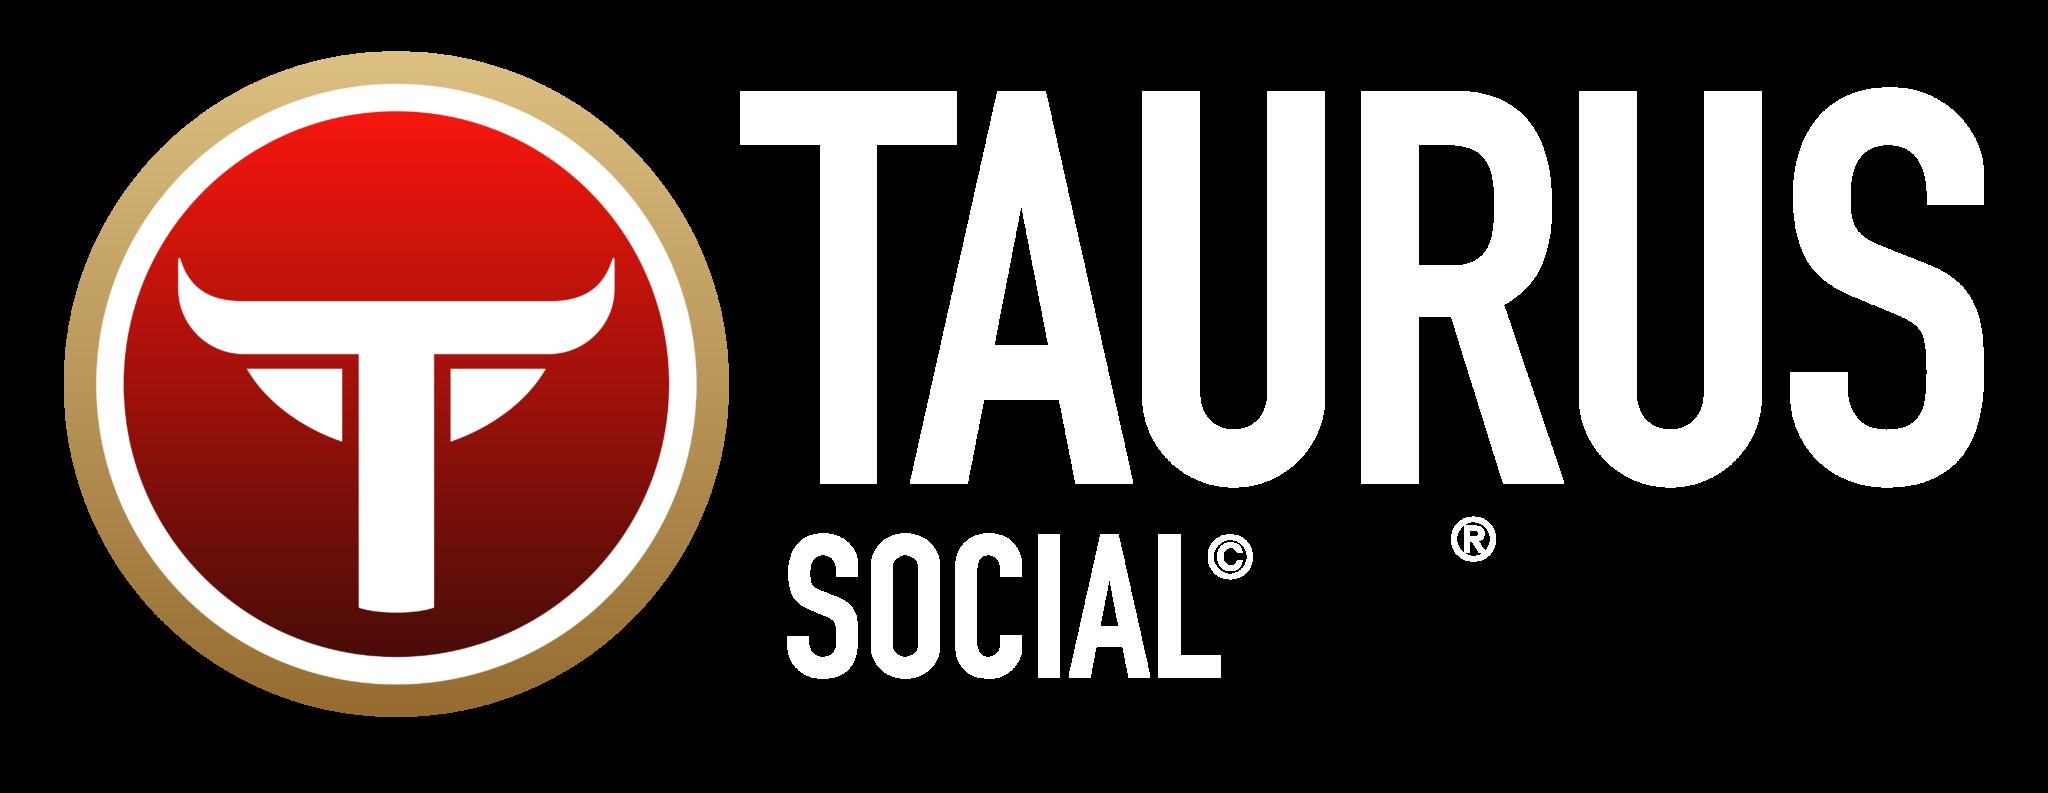 Taurus Marketing logos 56